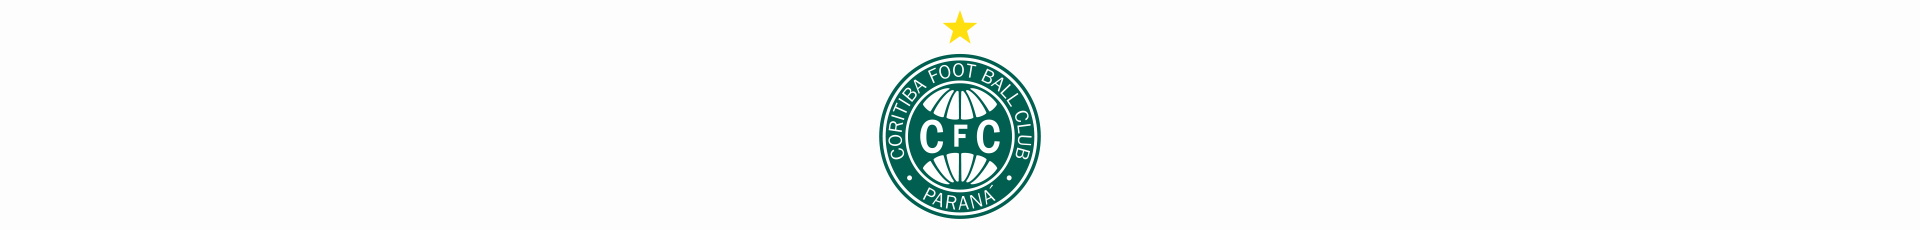 Banner Coritiba